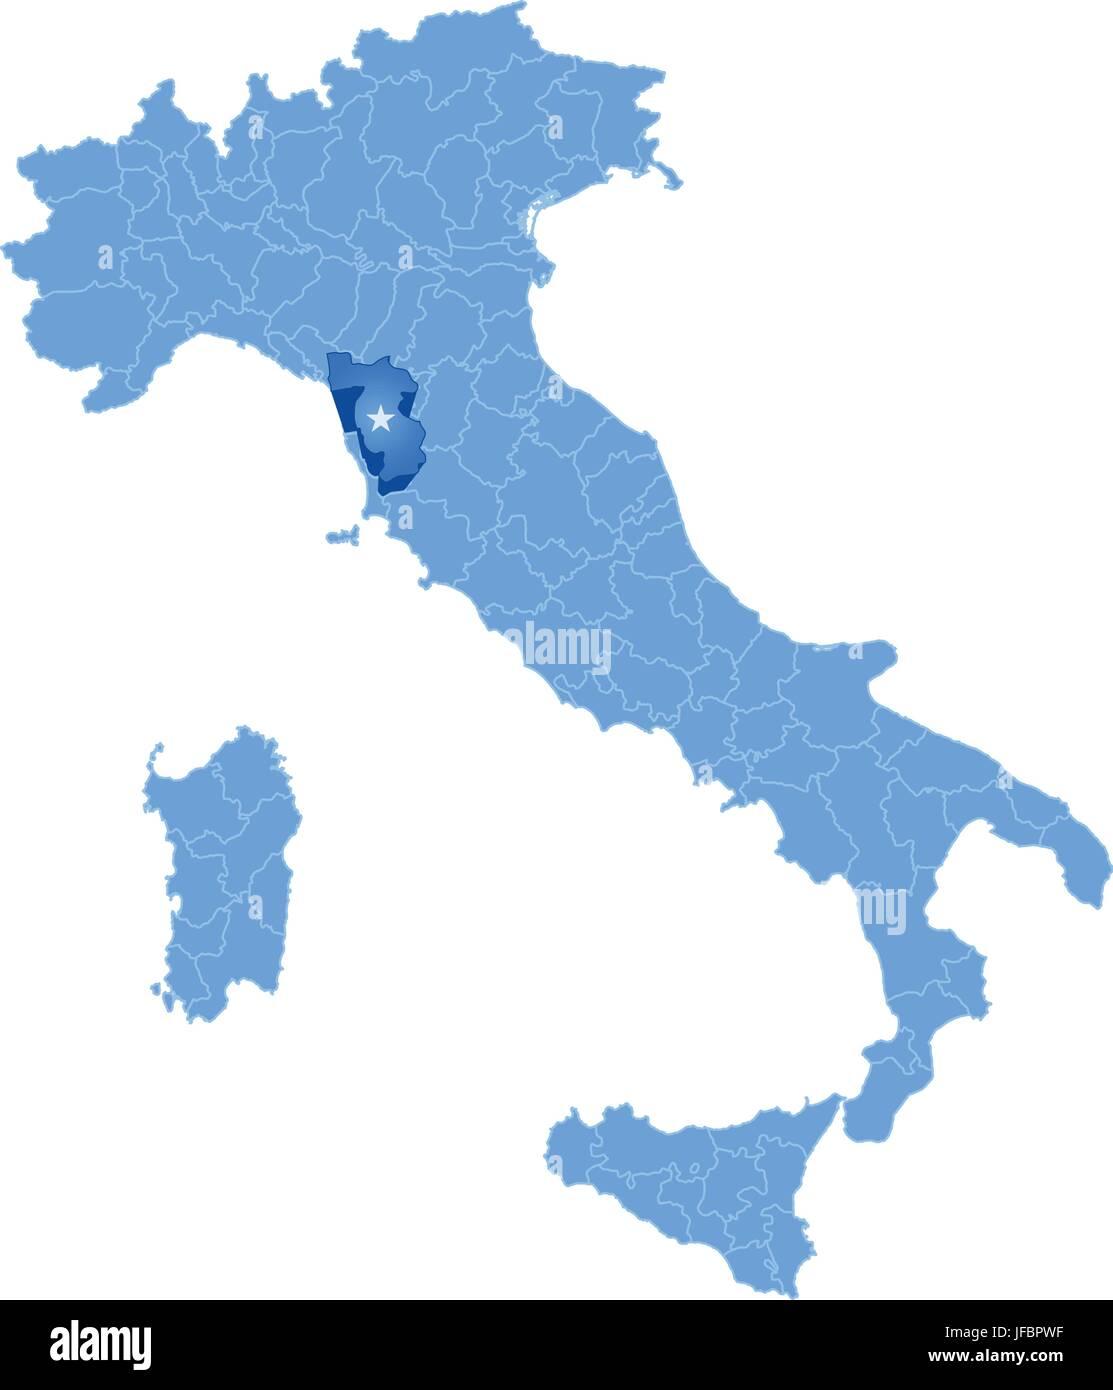 Map of italy pisa stock vector art illustration vector image map of italy pisa gumiabroncs Choice Image